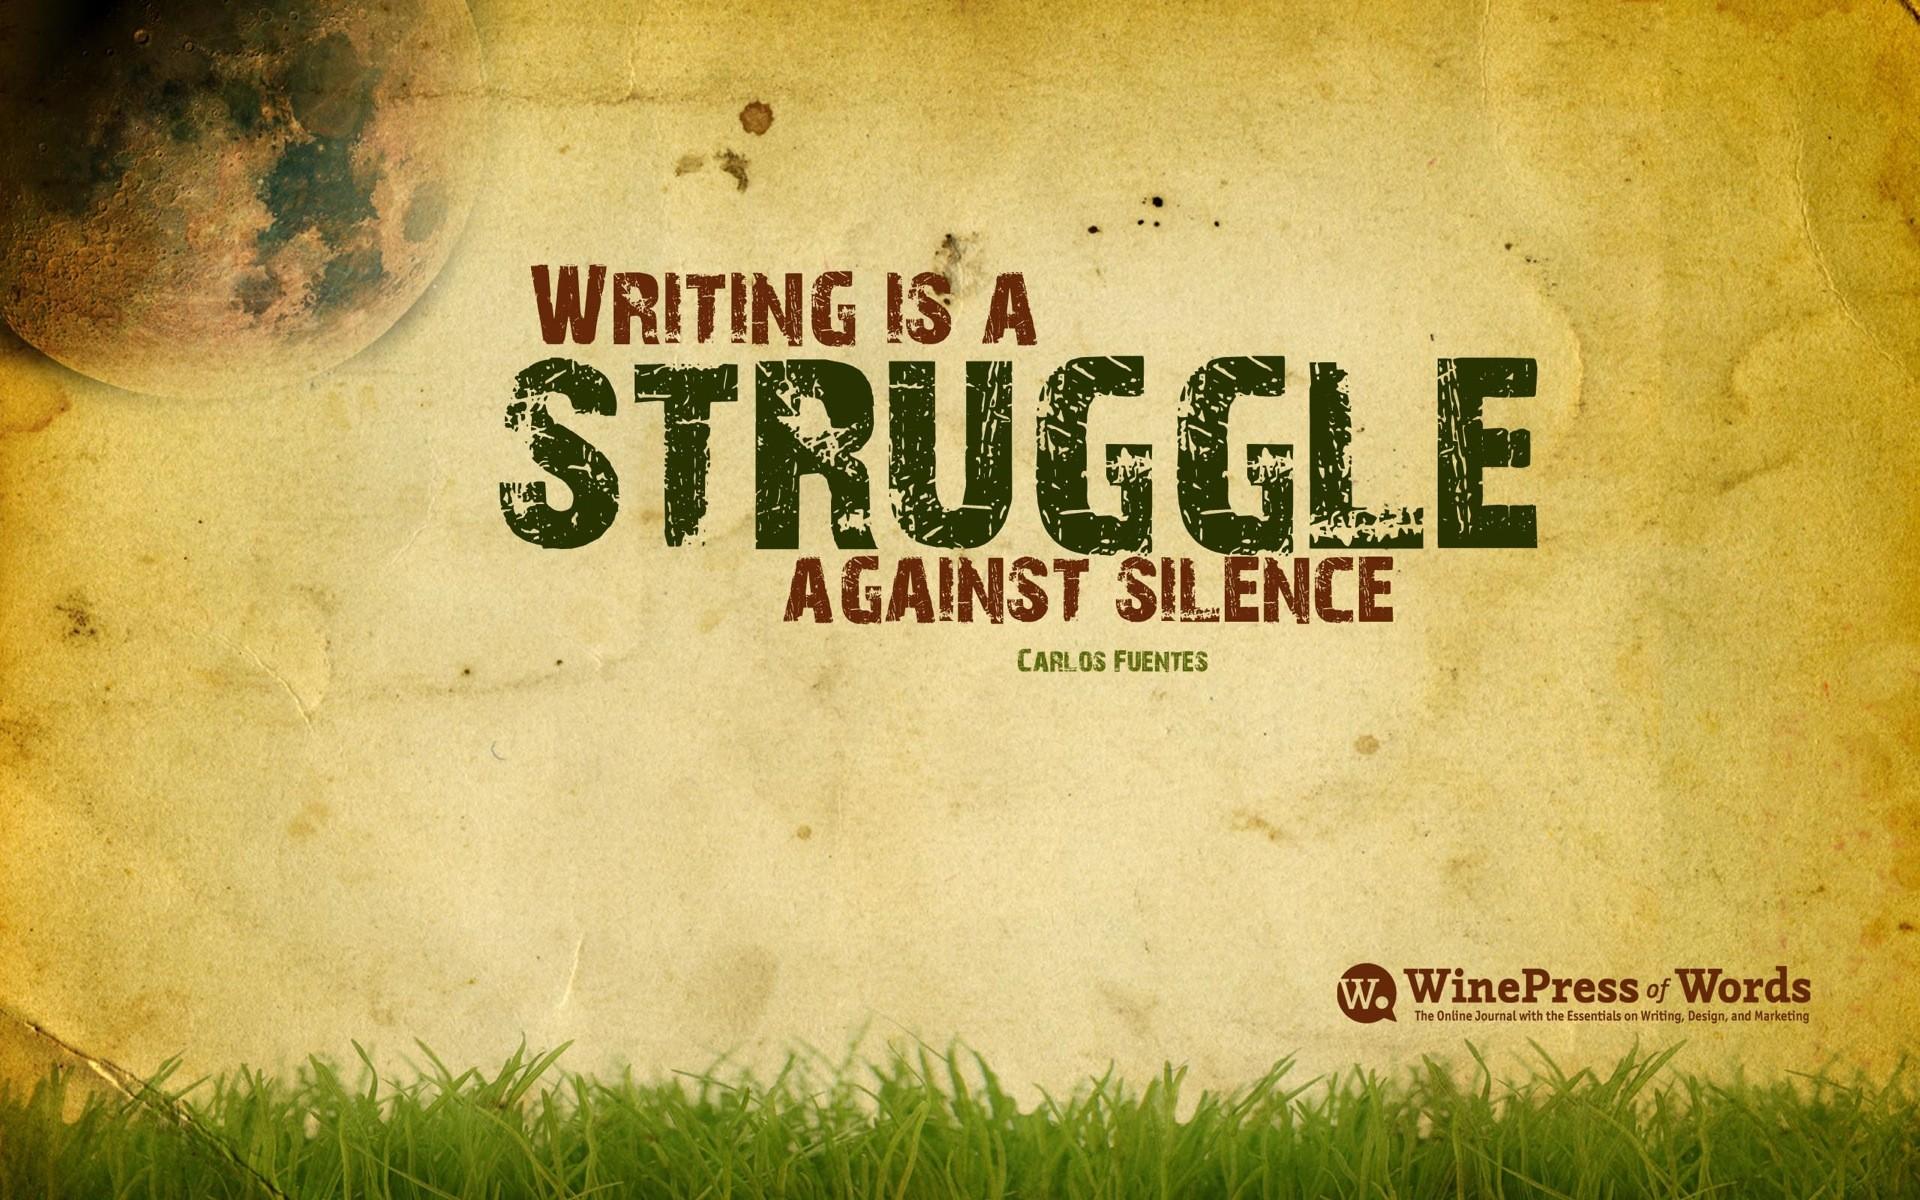 Write quote #2